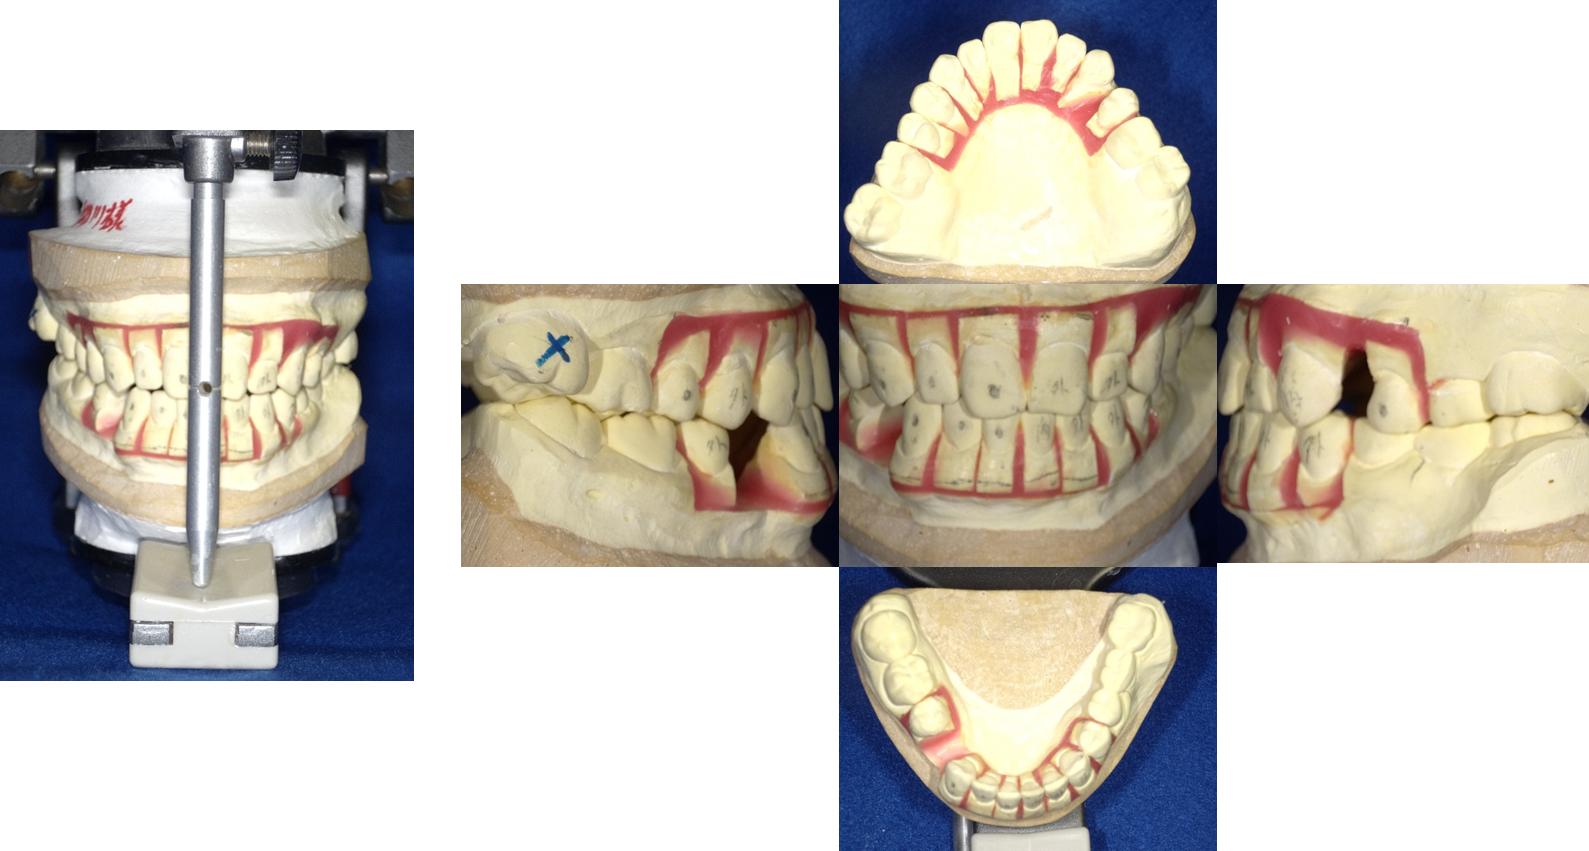 歯の模型 術後